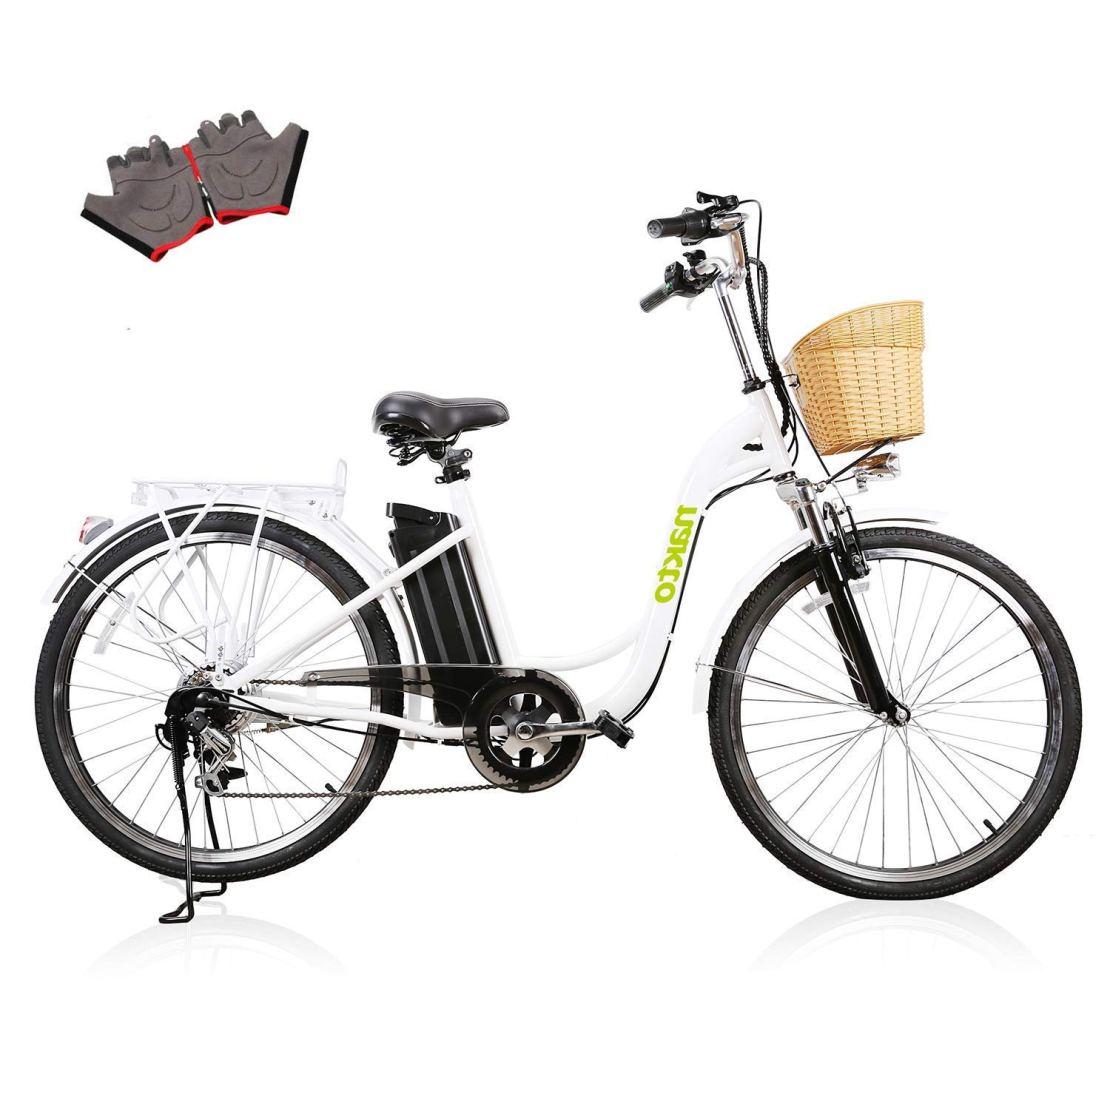 71KwGz2Wr3L. SL1500  - 10 Best Electric Bikes 2019